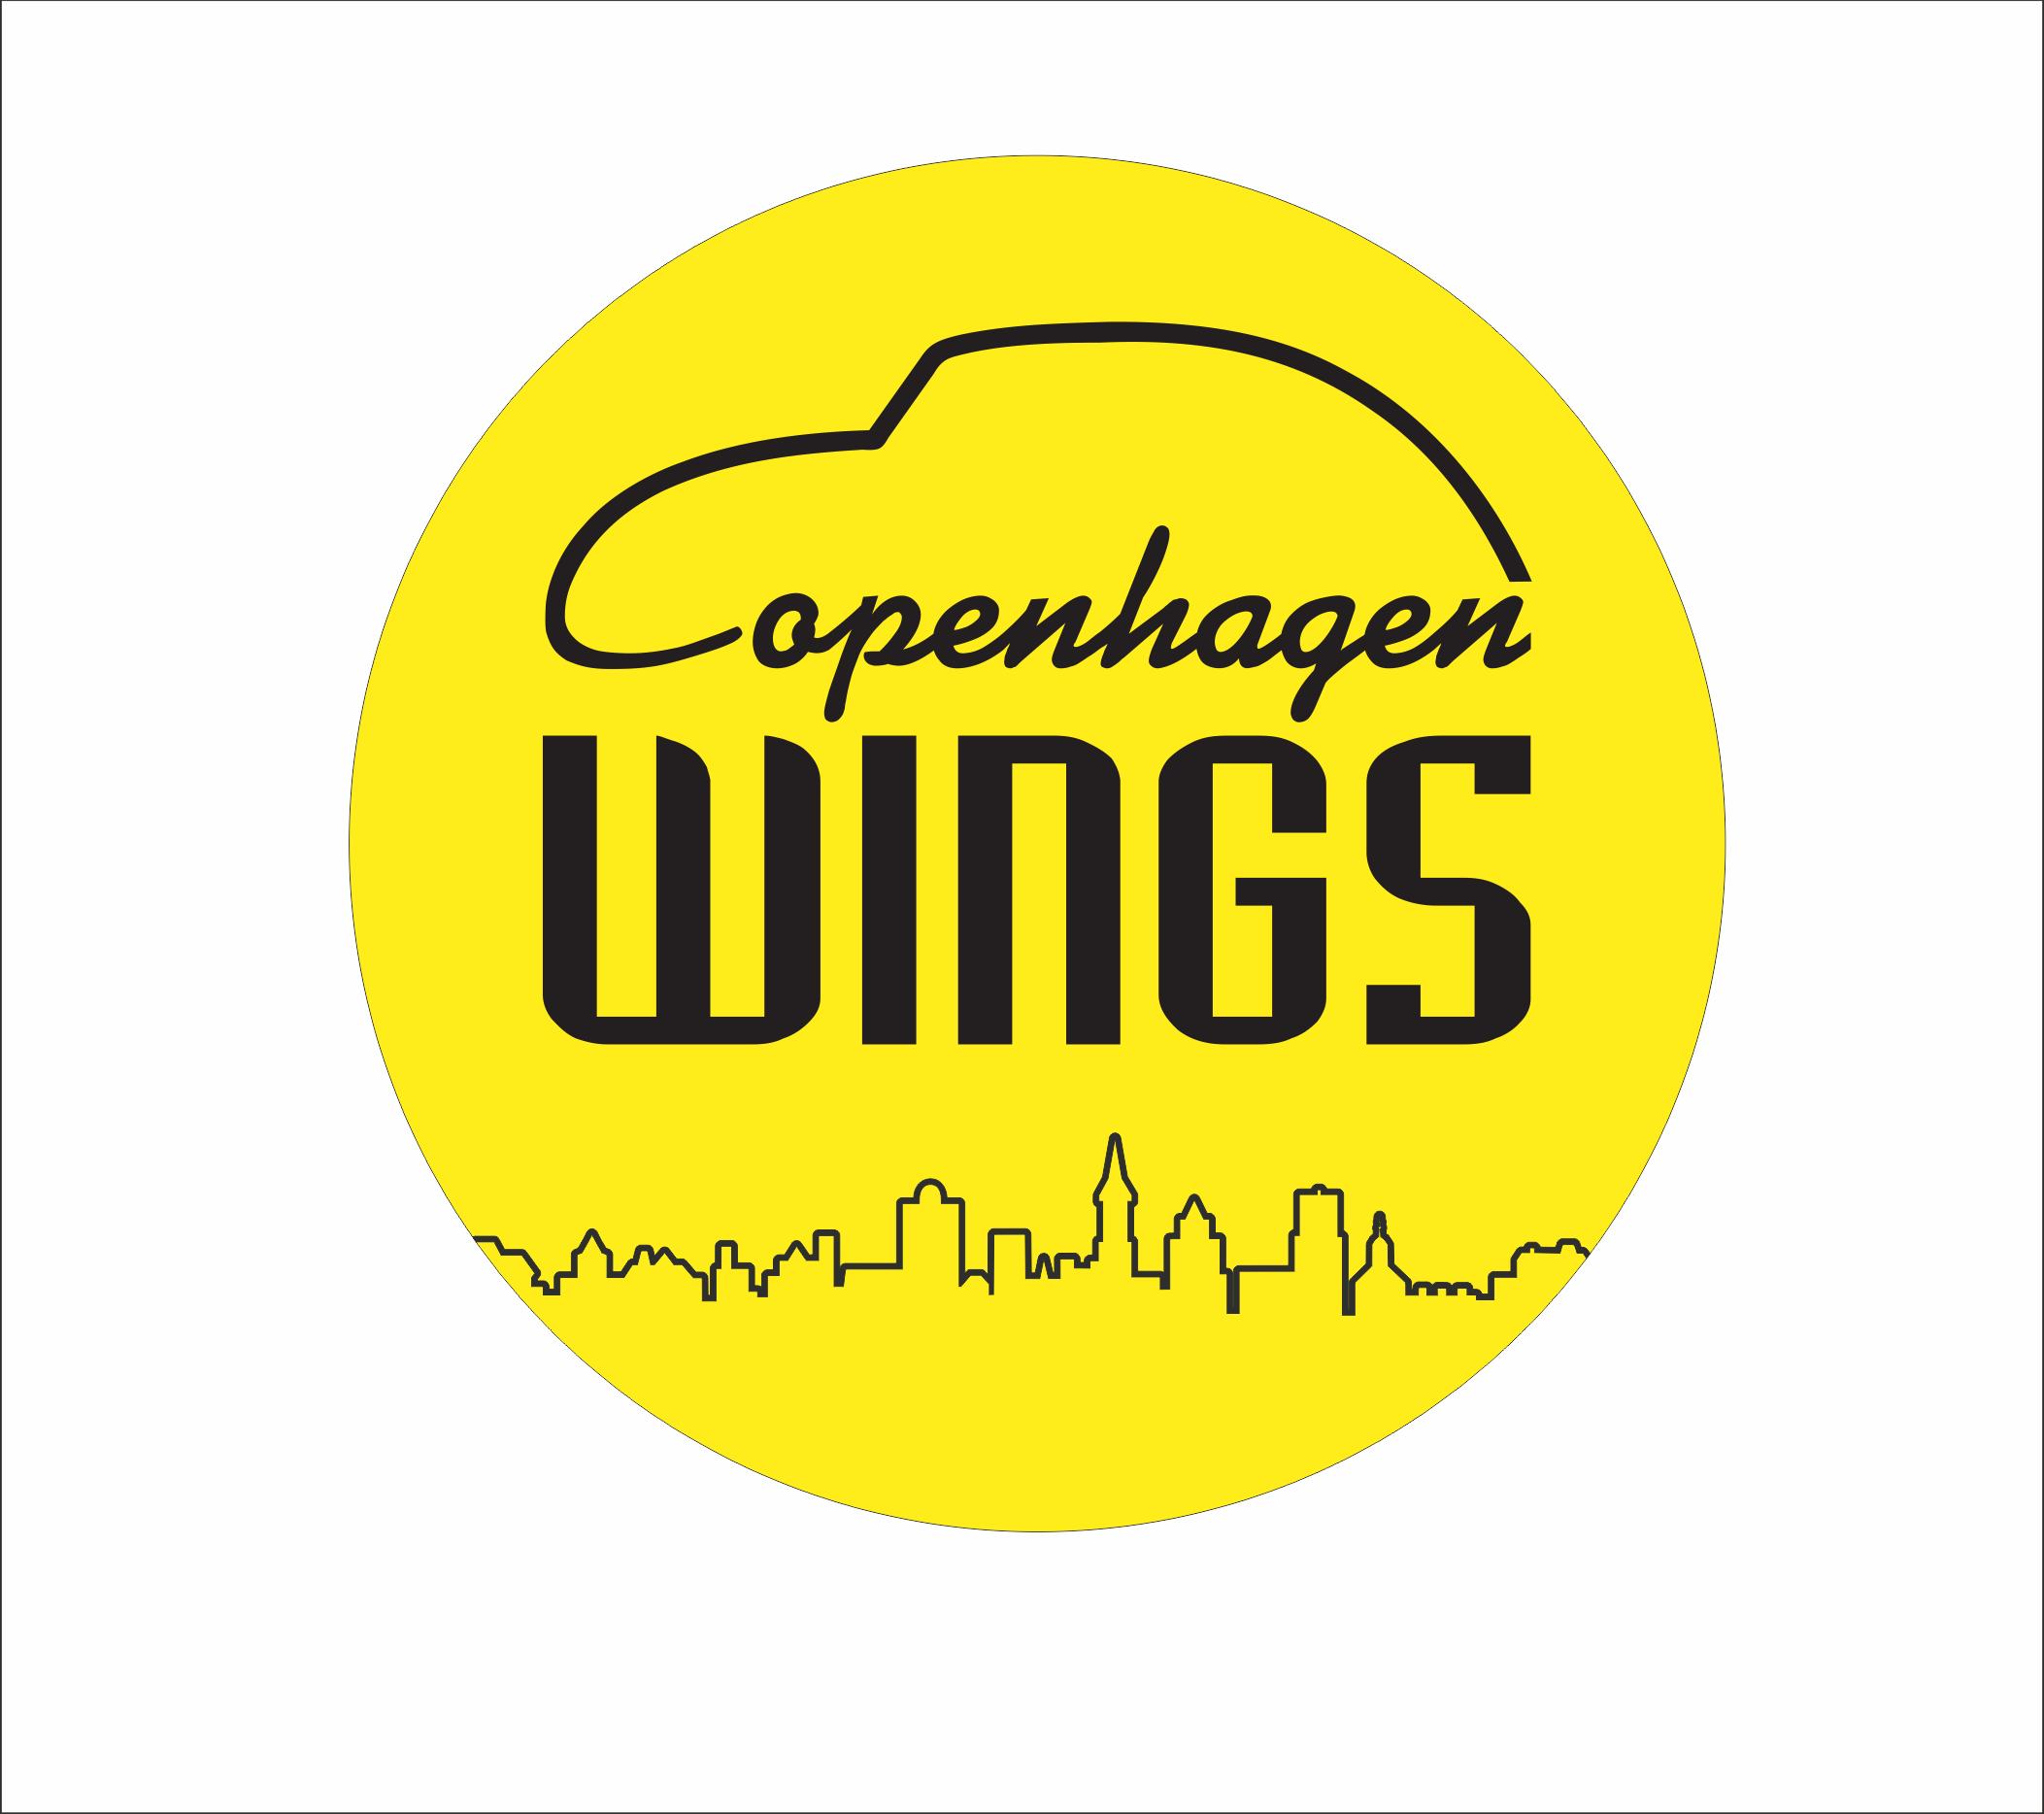 Copenhagen Wings